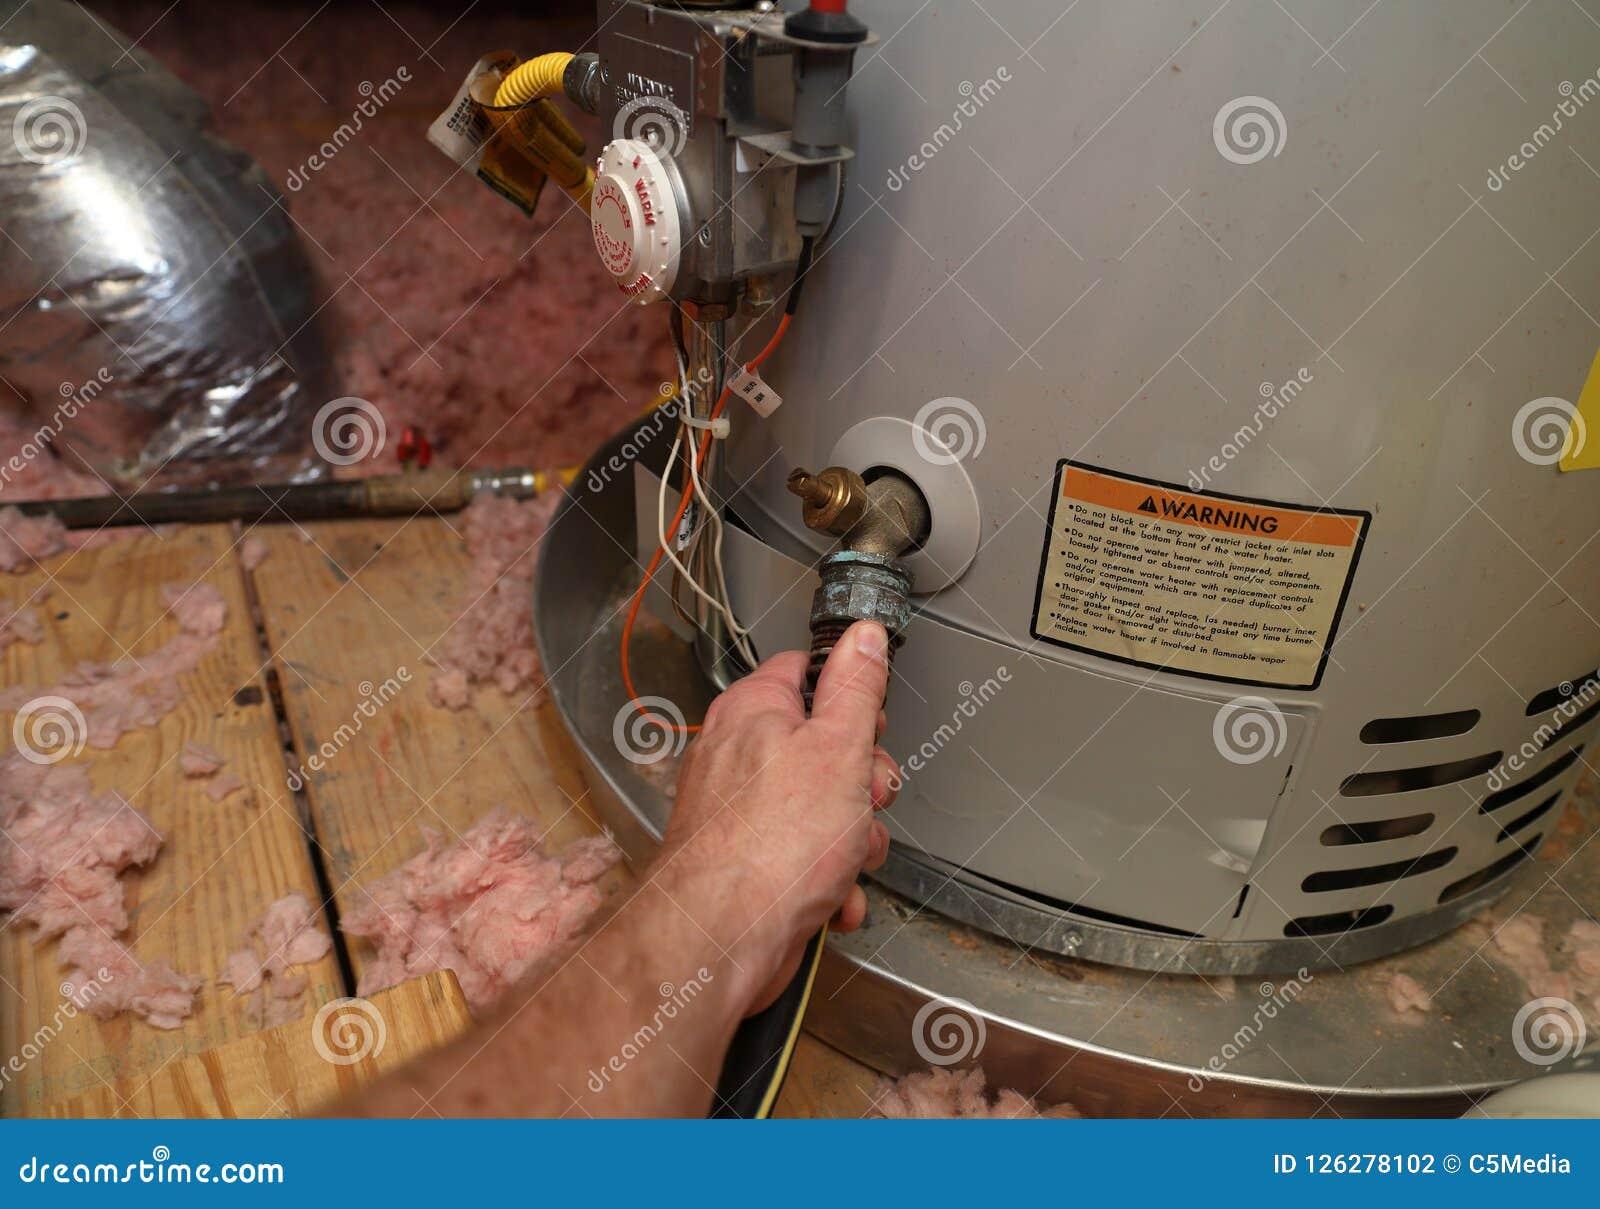 La main attache le tuyau au chauffe-eau de drain